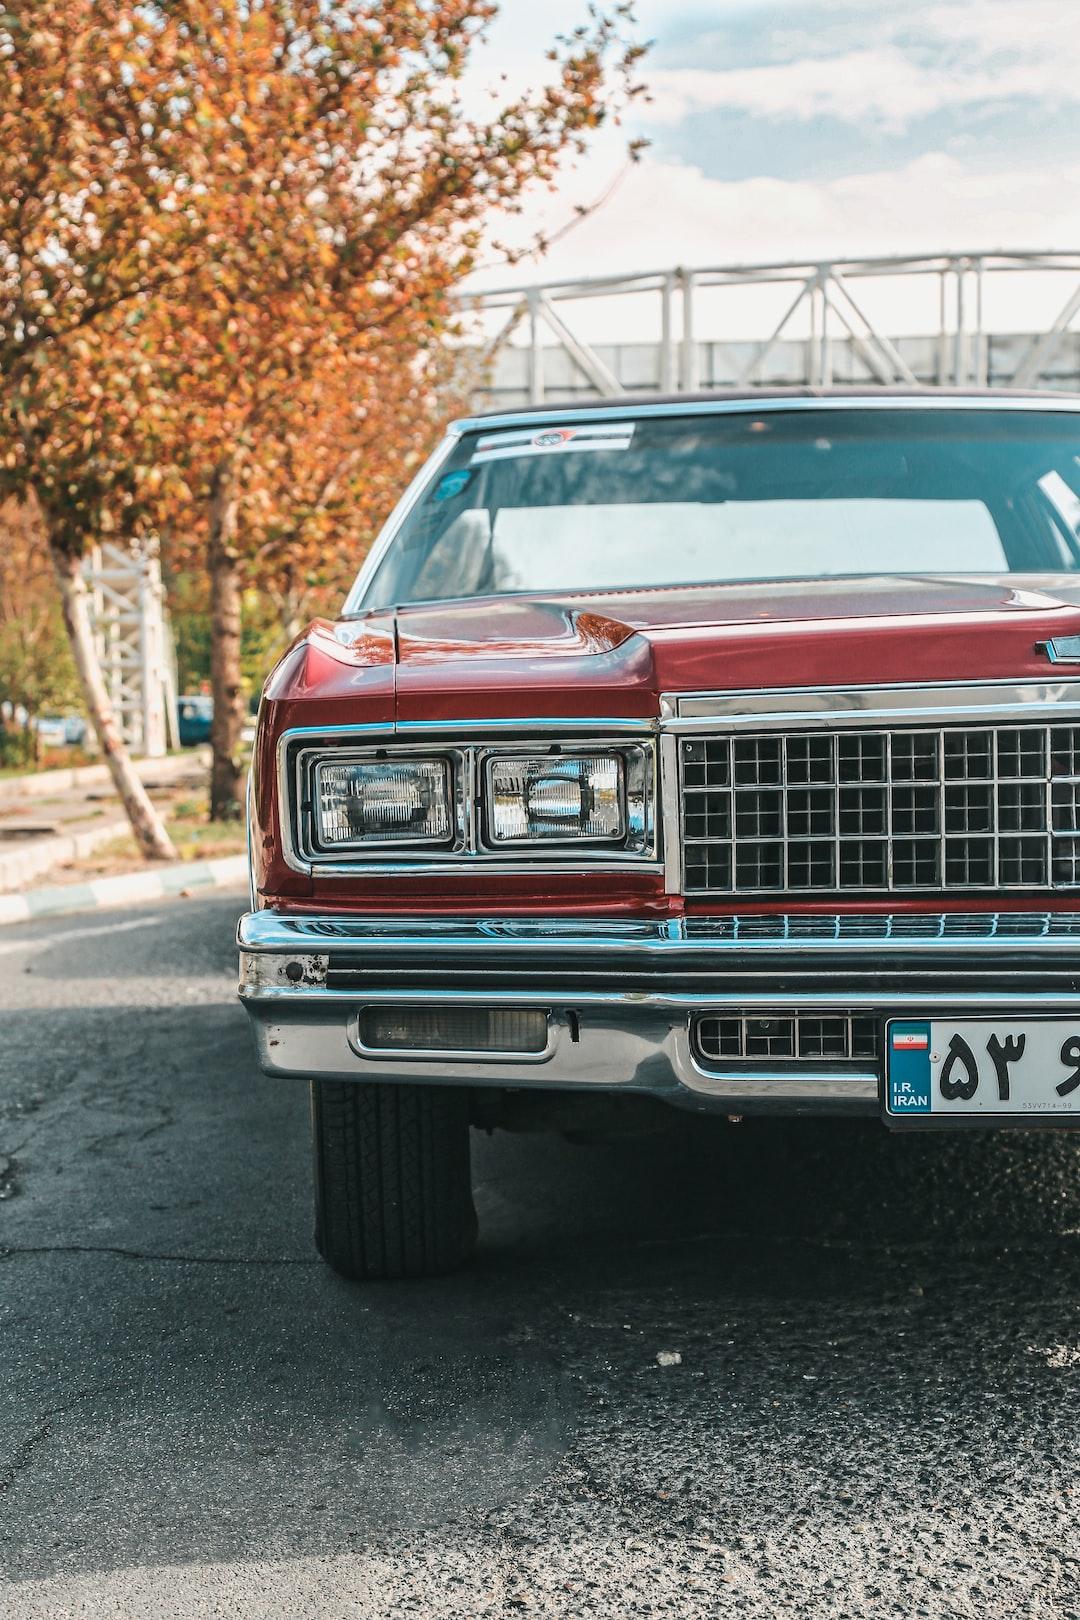 1976 Chevrolet Caprice classic in iran.